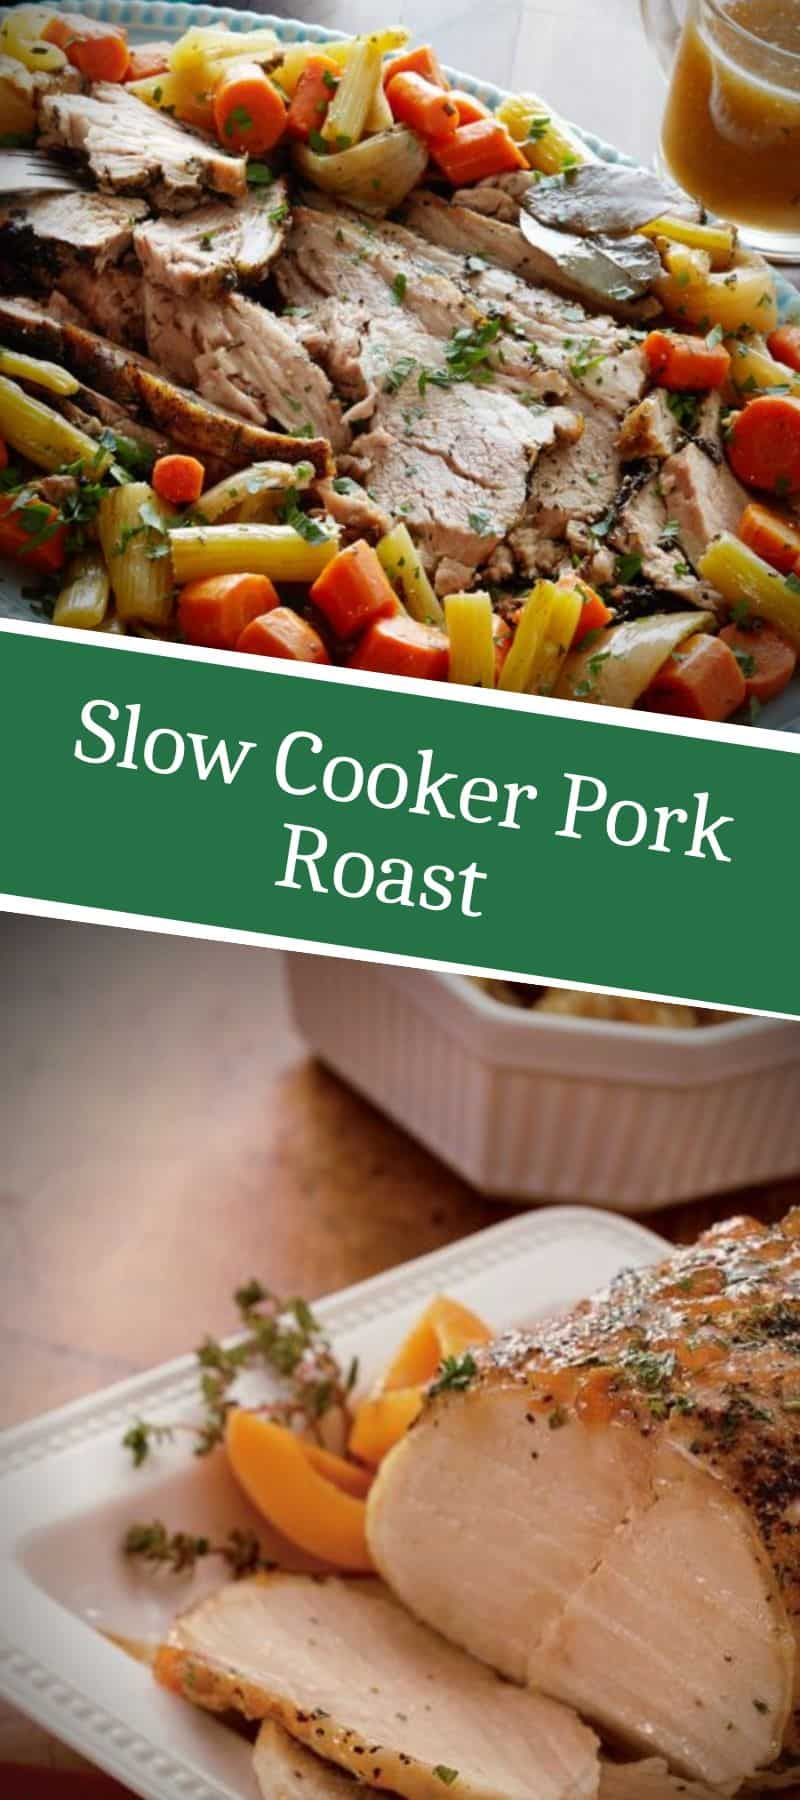 Slow Cooker Pork Roast Recipe 3